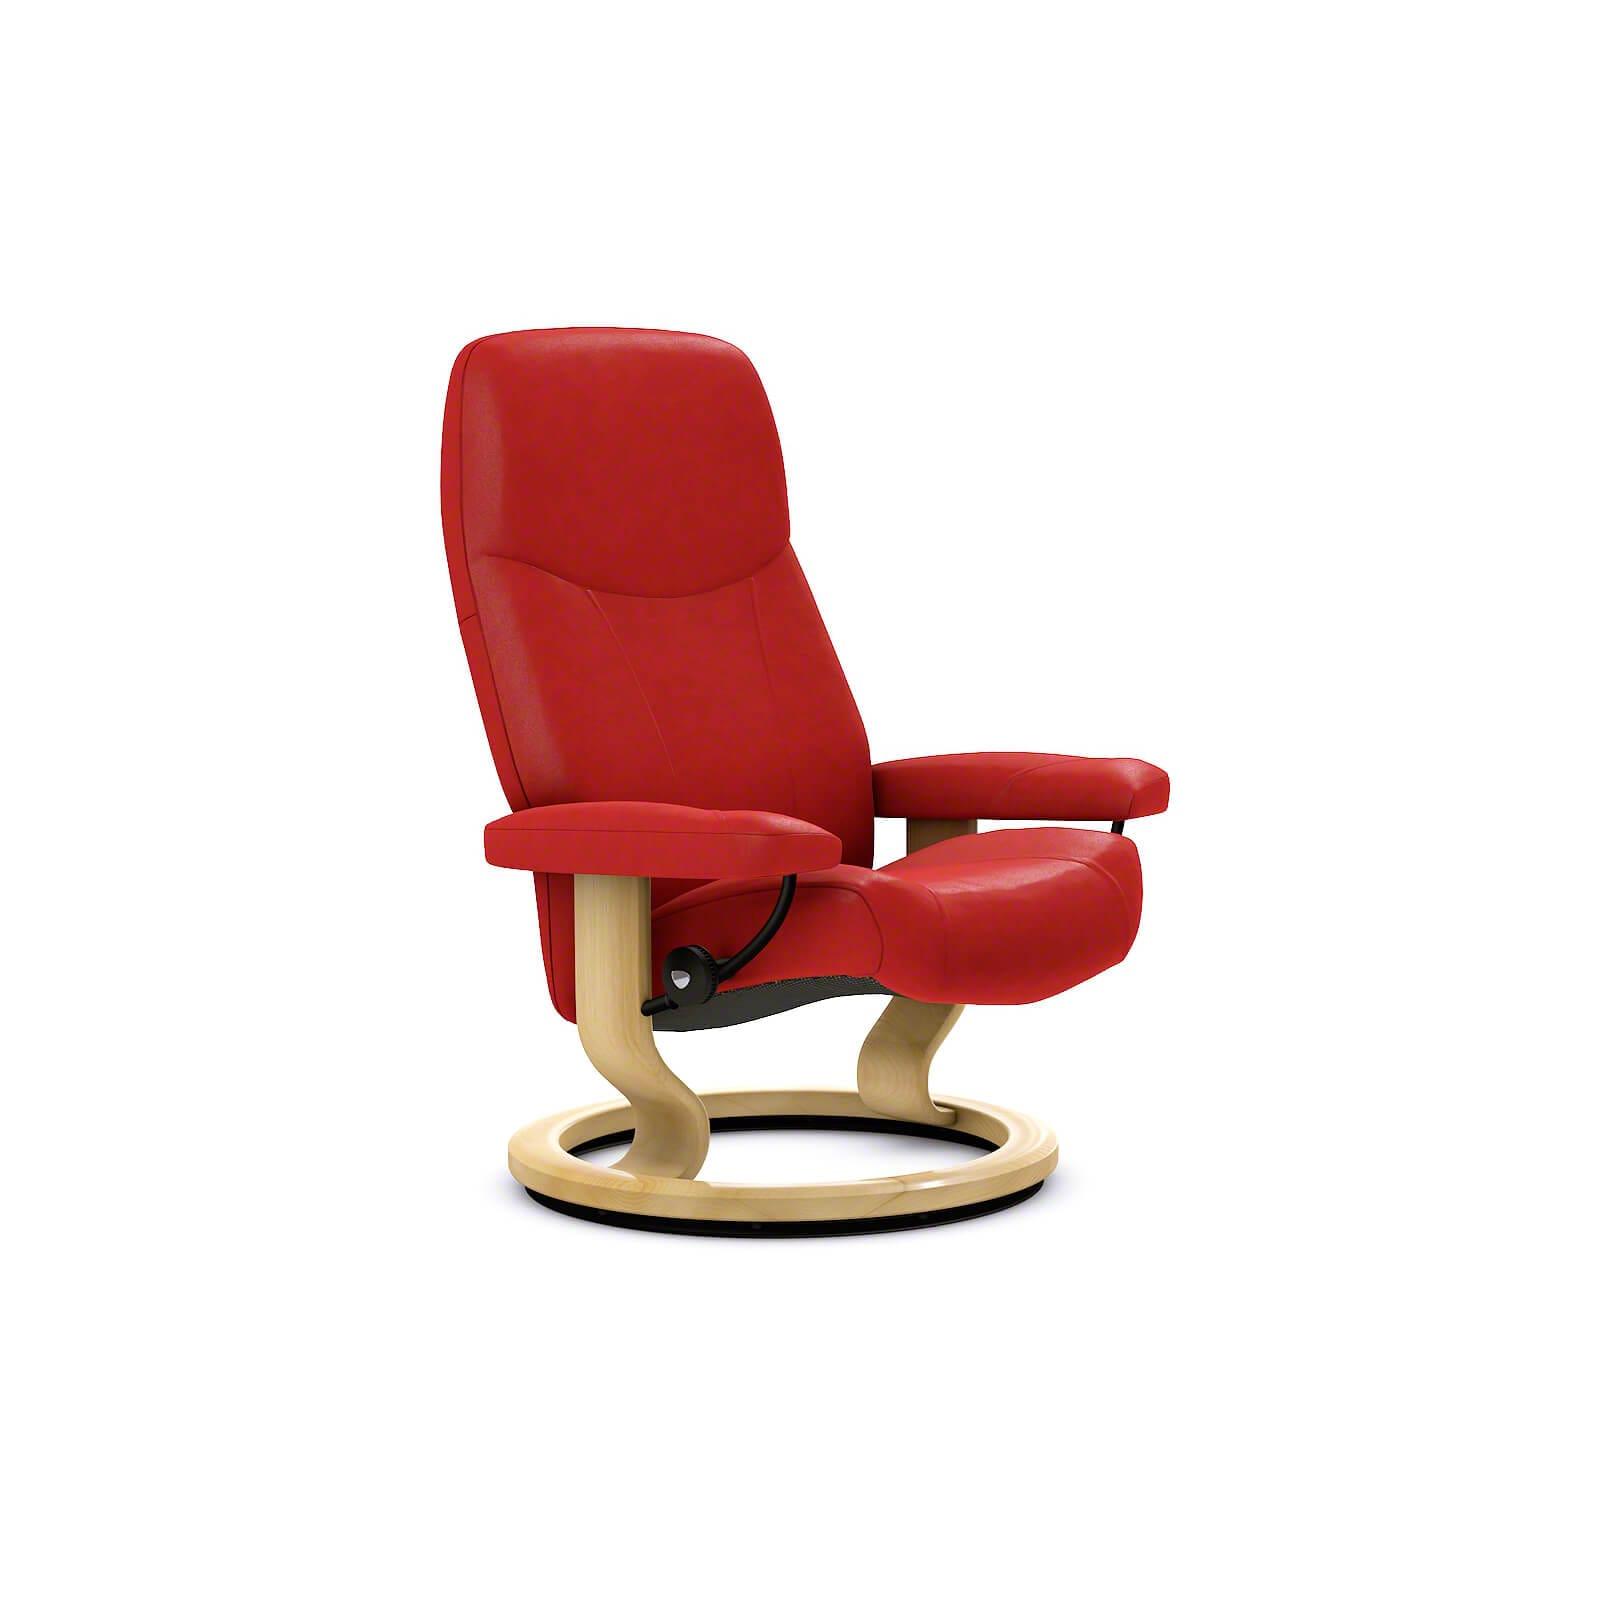 stressless consul sessel batick chilli red stressless. Black Bedroom Furniture Sets. Home Design Ideas